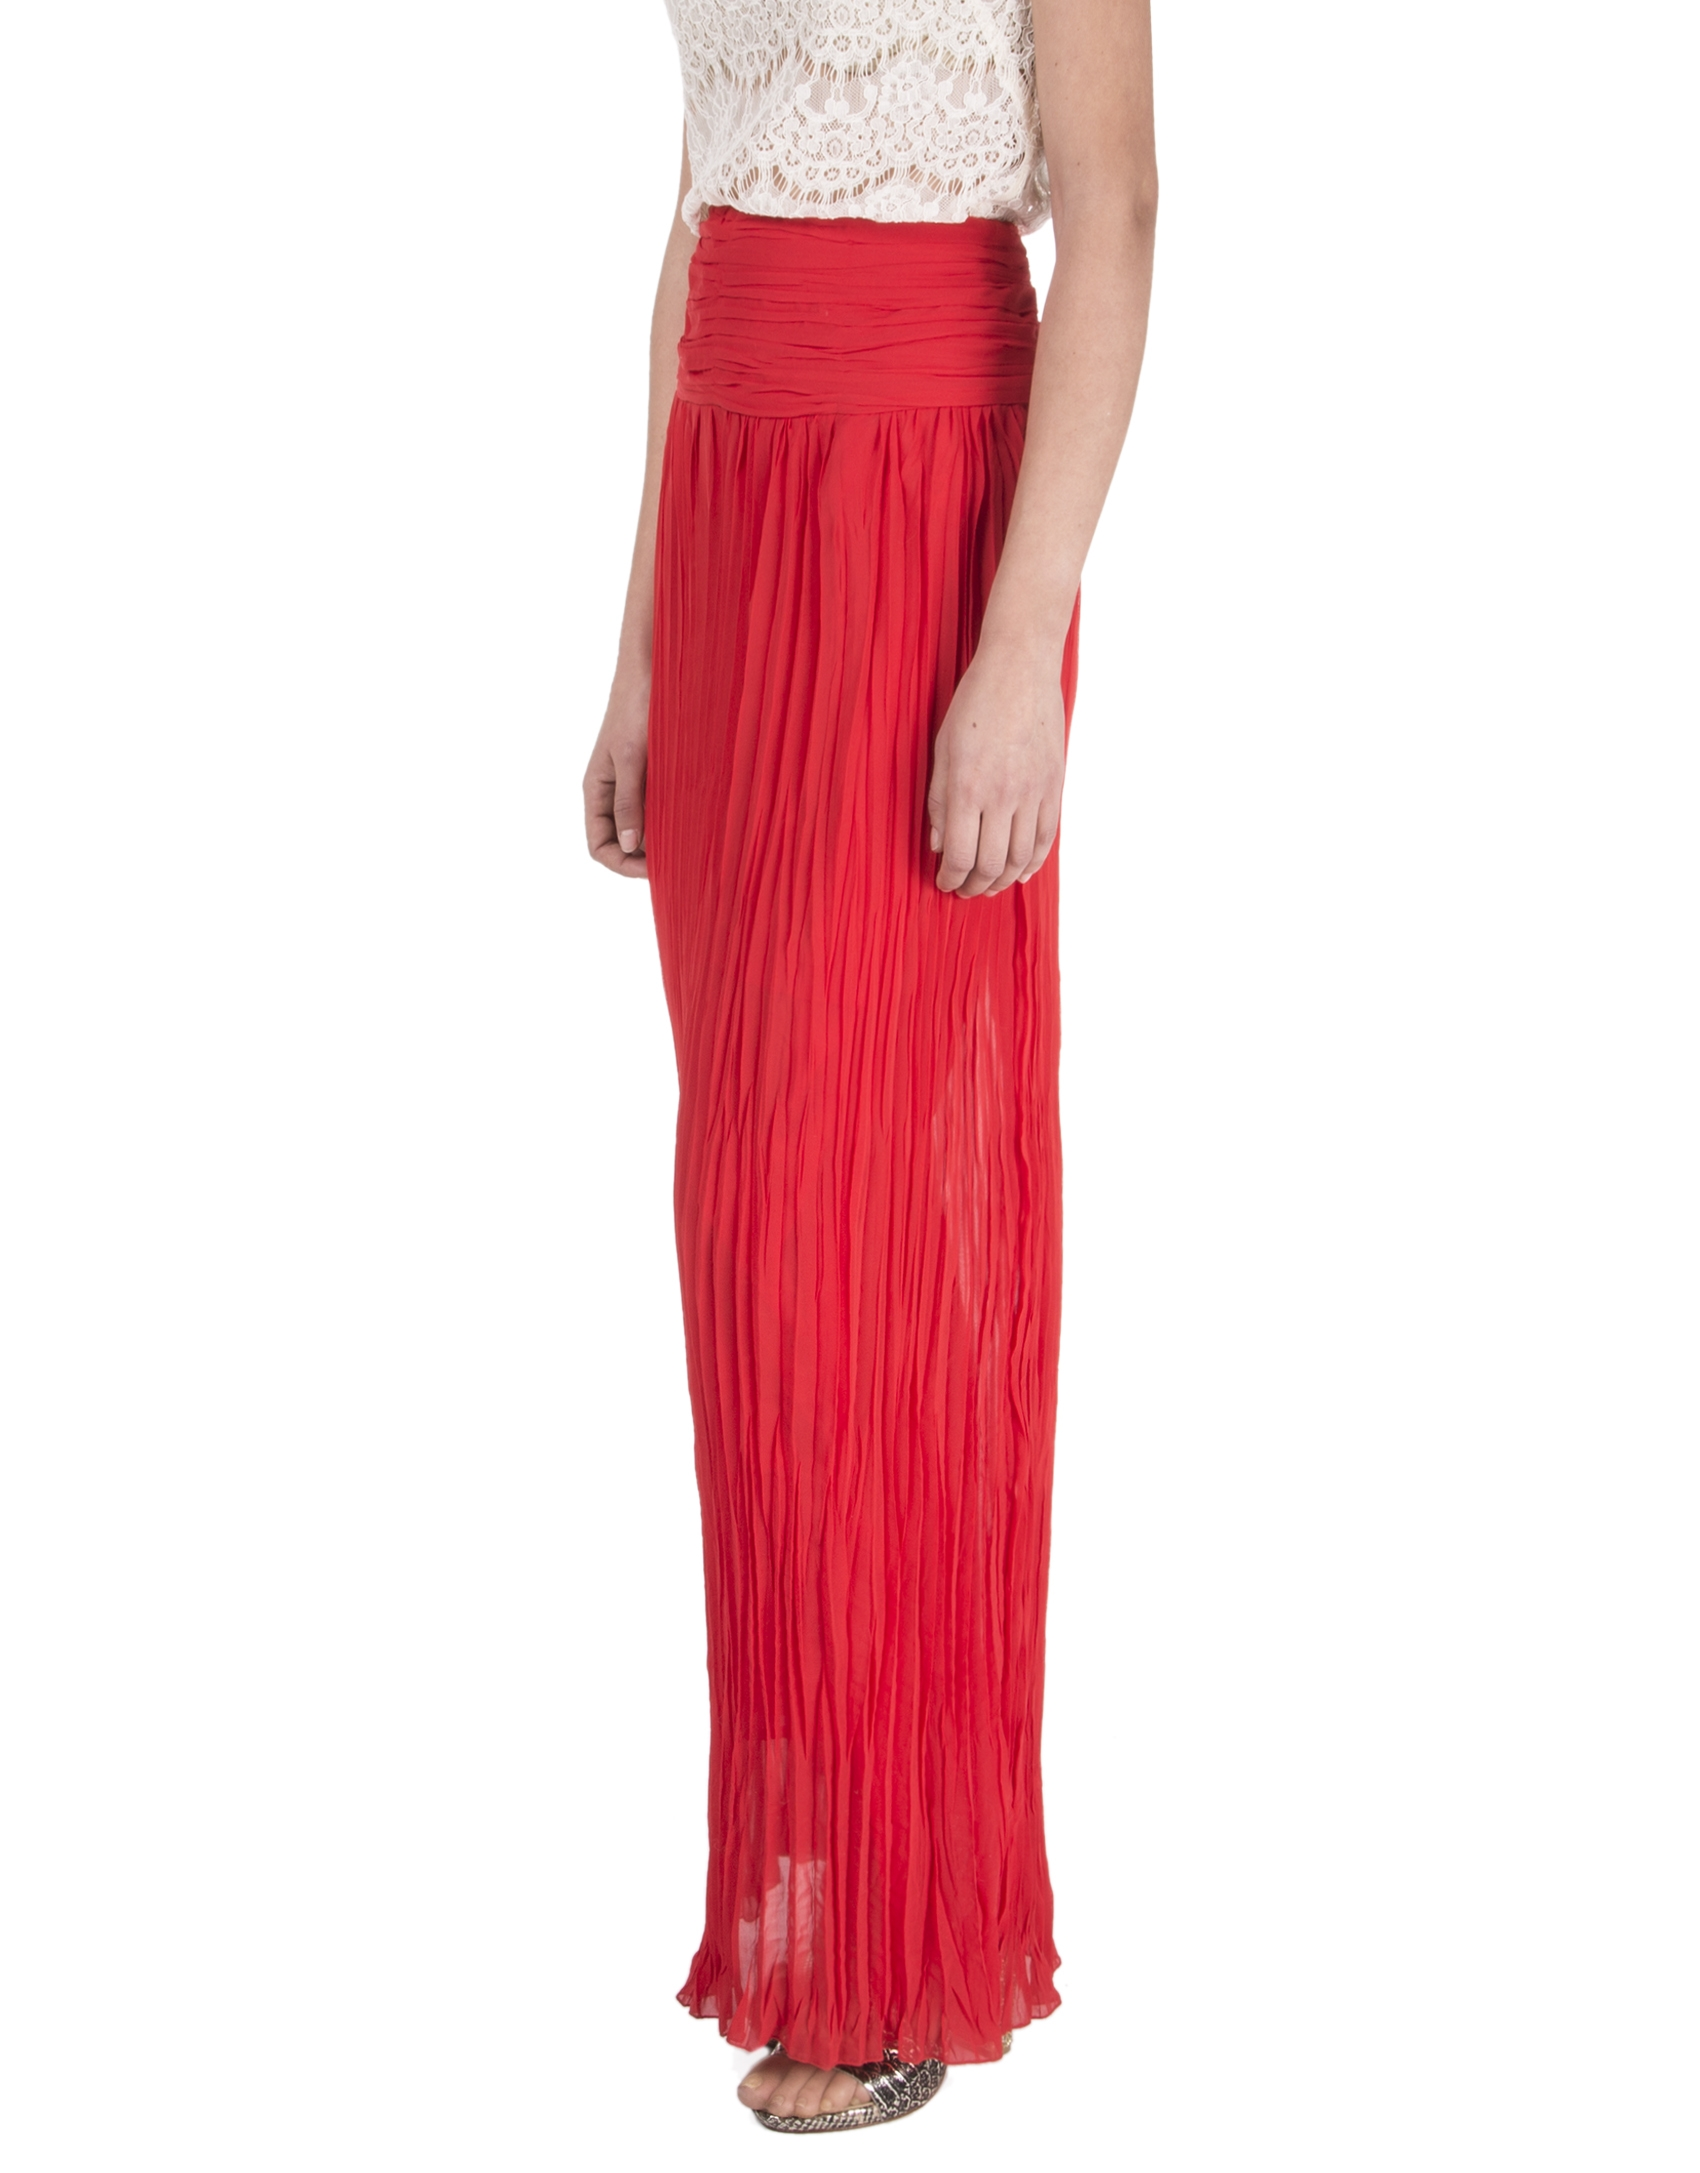 Long red pleated skirt - Skirts - Woman | Roberto Verino